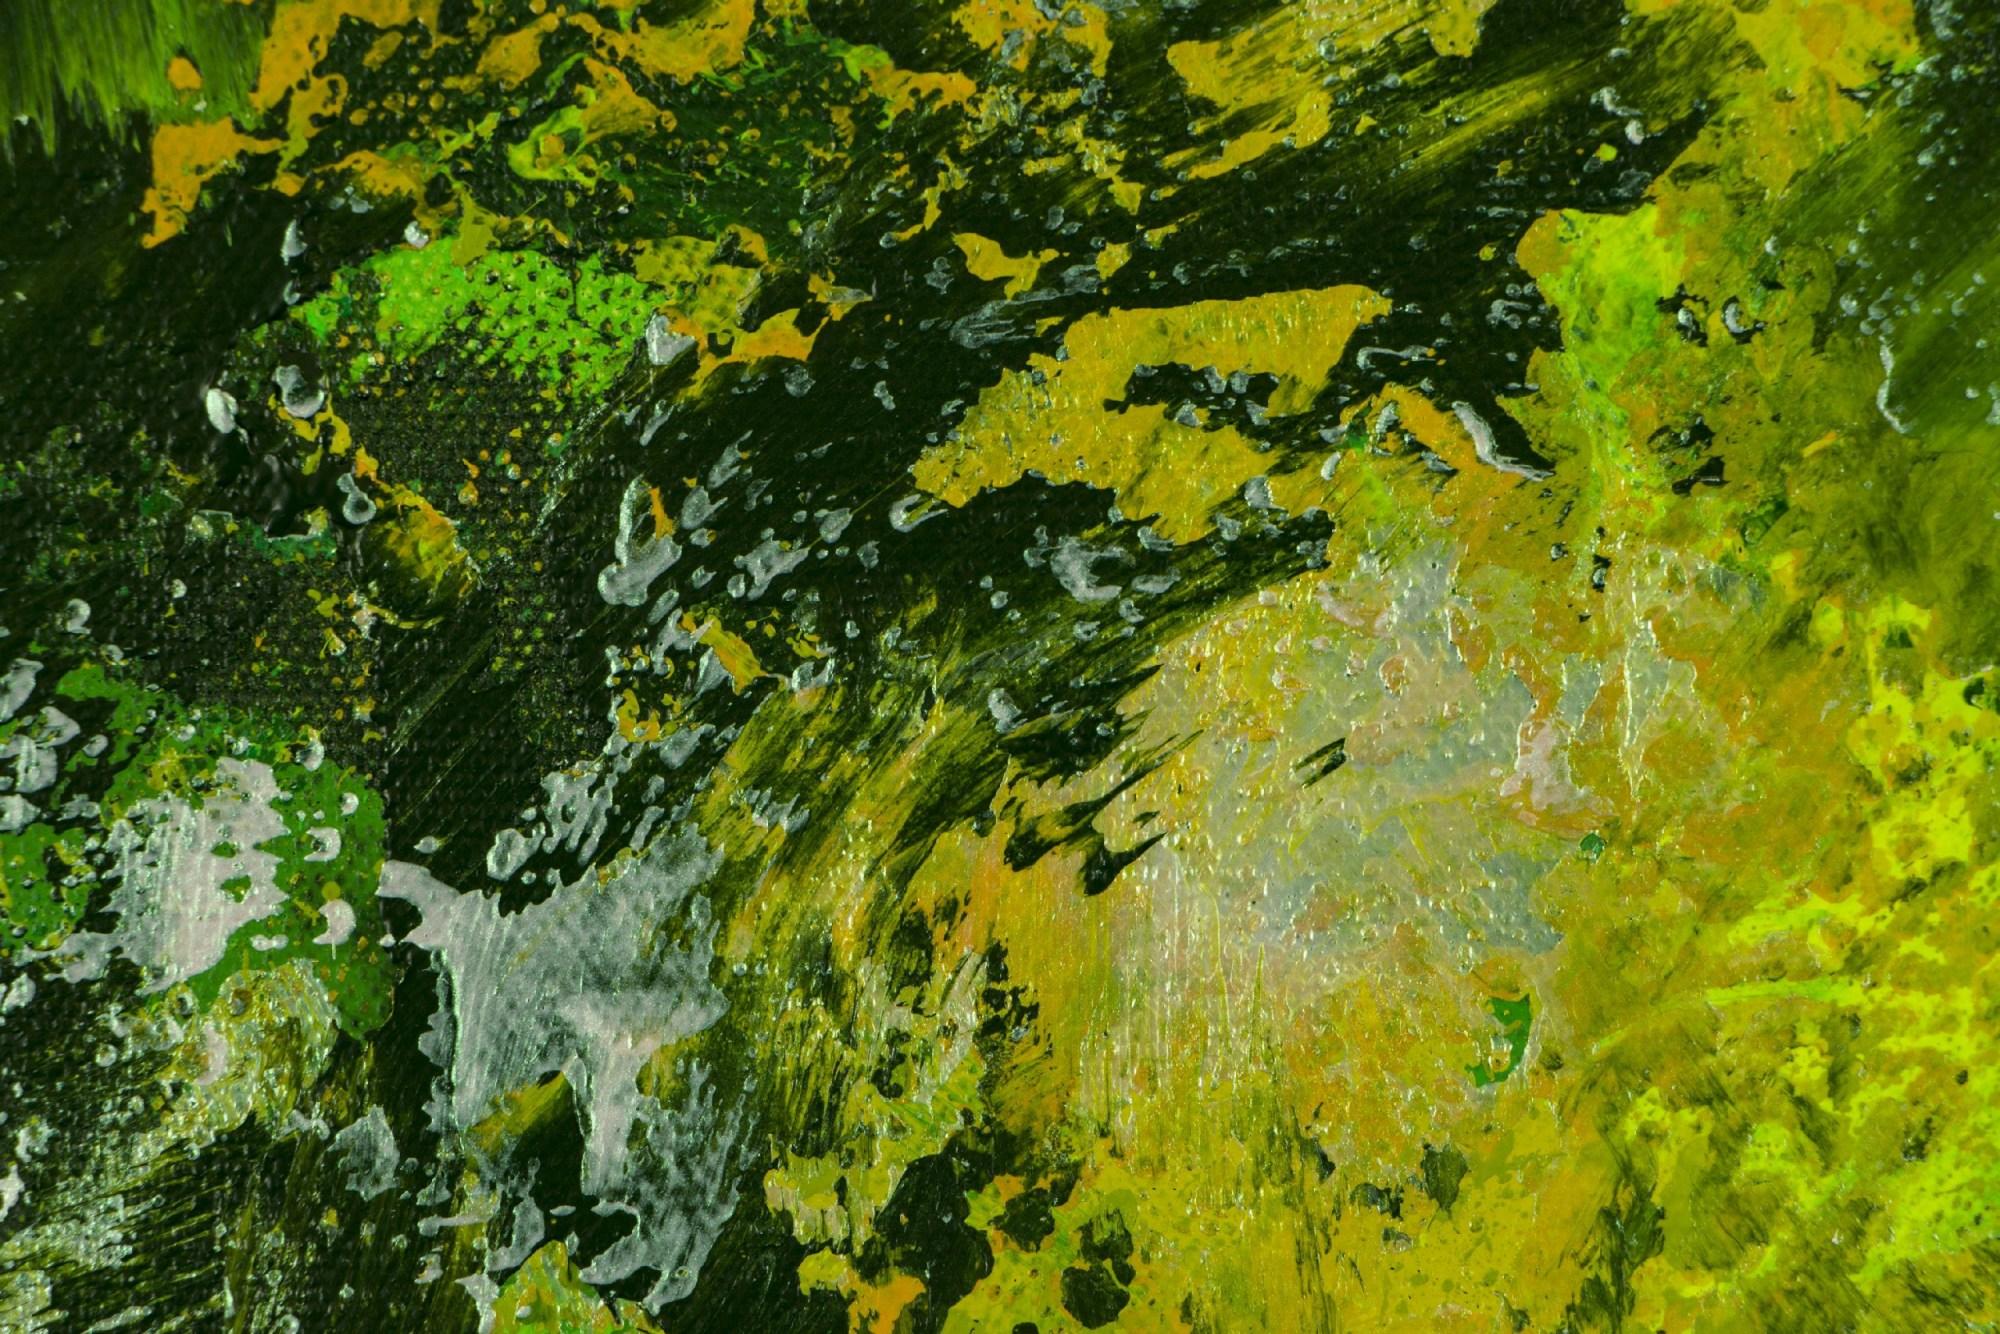 Detail / Verdor Spectra (vertical Garden) (2021) by Nestor Toro